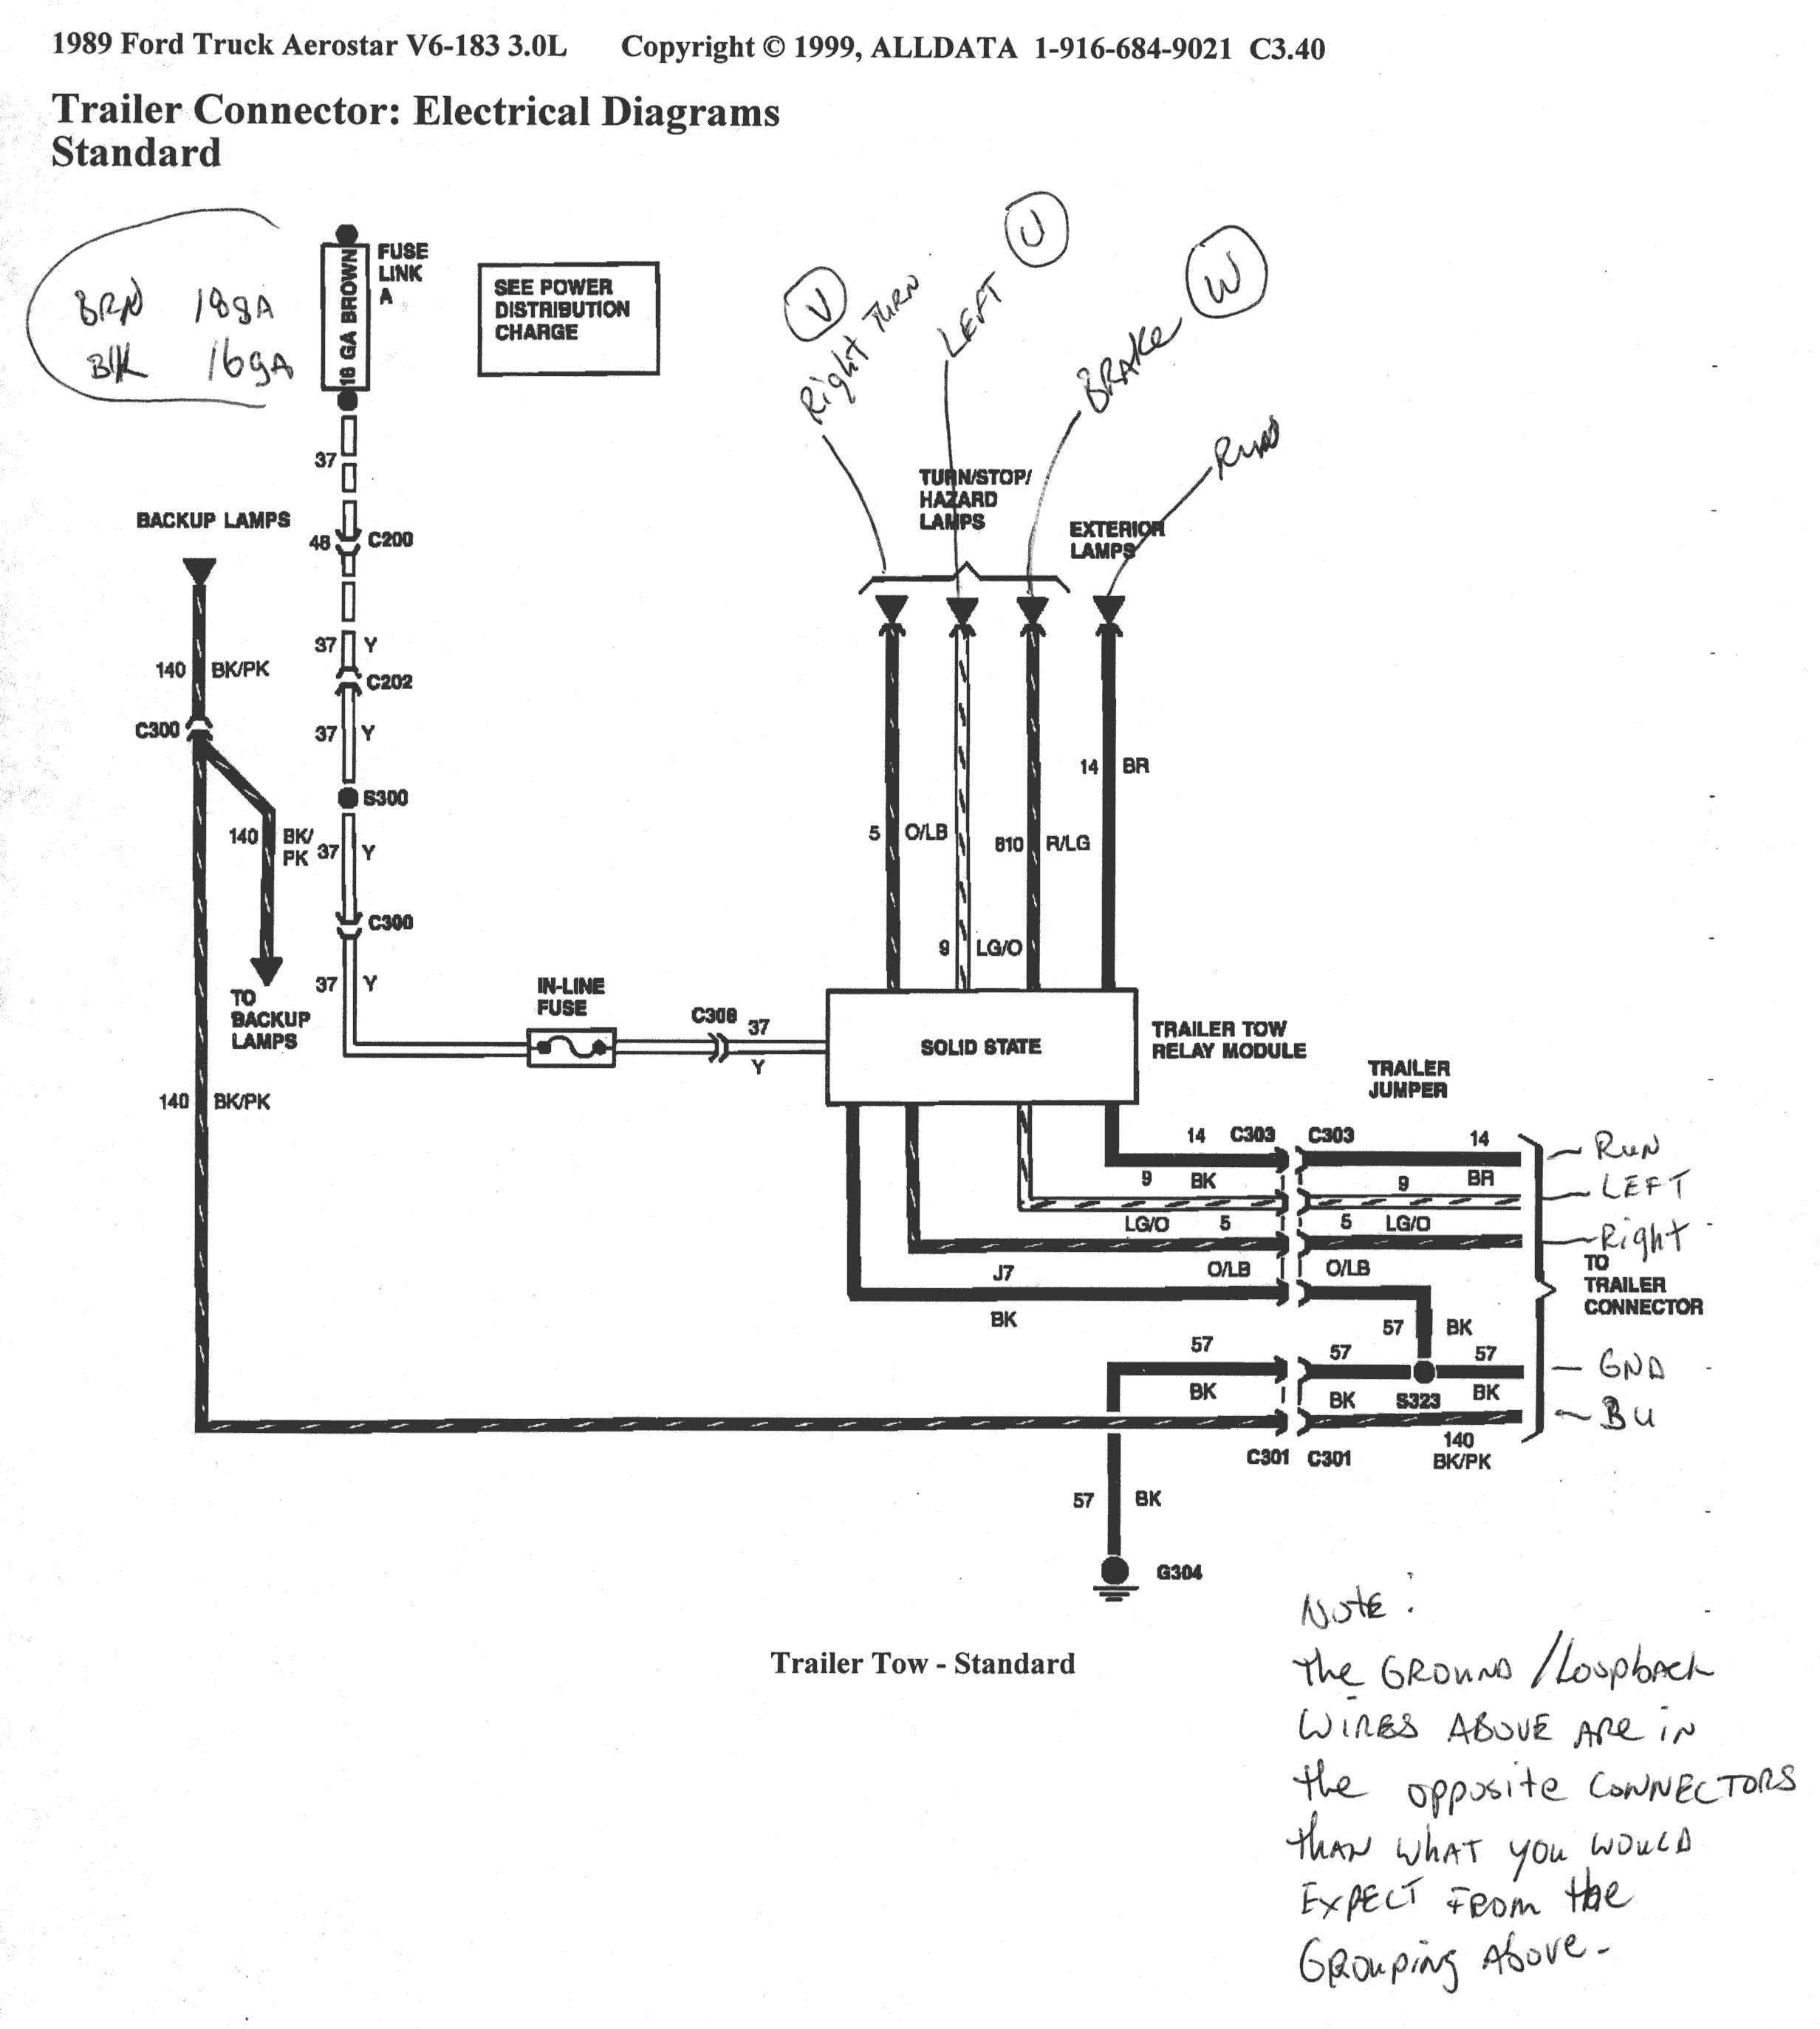 ford trailer wiring diagram best of wiring diagram image rh mainetreasurechest com 2001 F350 Fuse Diagram 2004 F350 Fuse Panel Diagram